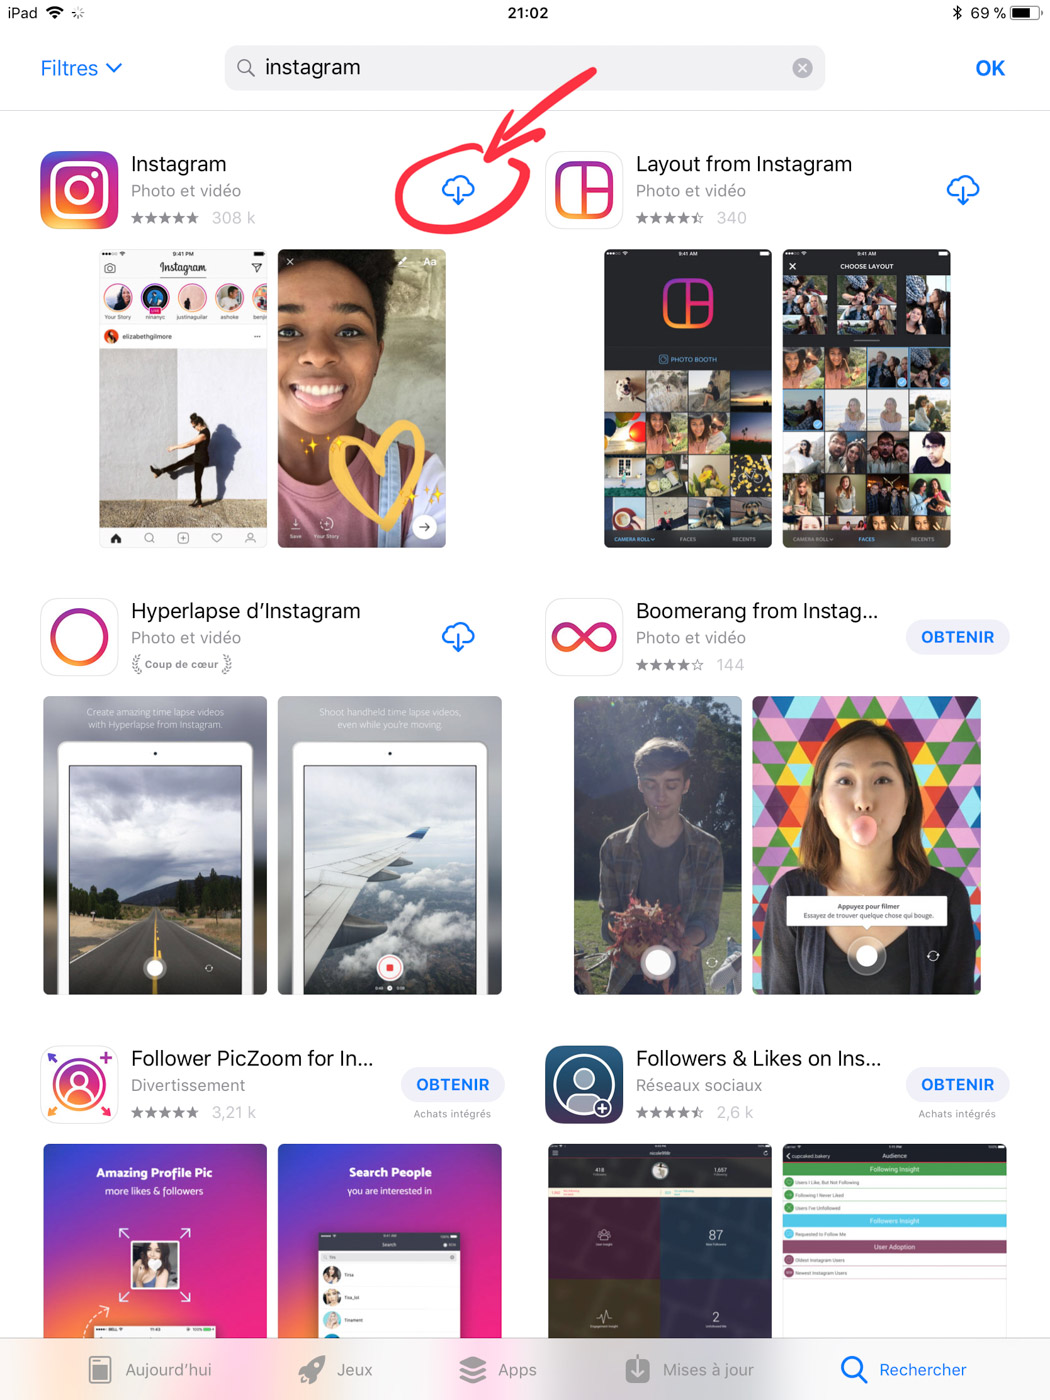 Installer instagram sur ipad yapasfoto - Comment installer office 365 sur ipad ...